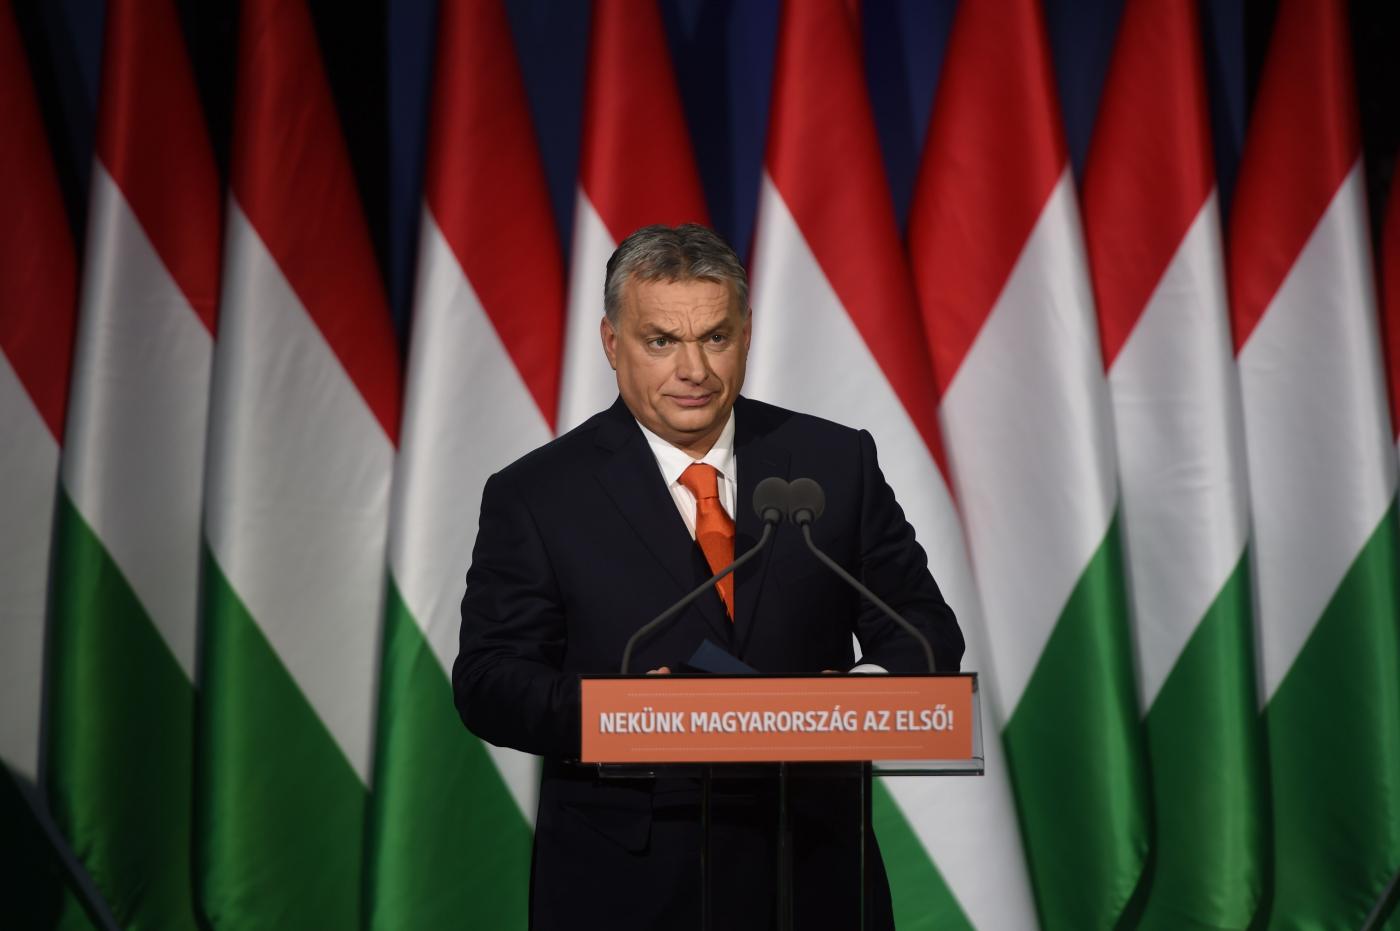 Viktor Orban durante un comizio (LaPresse)